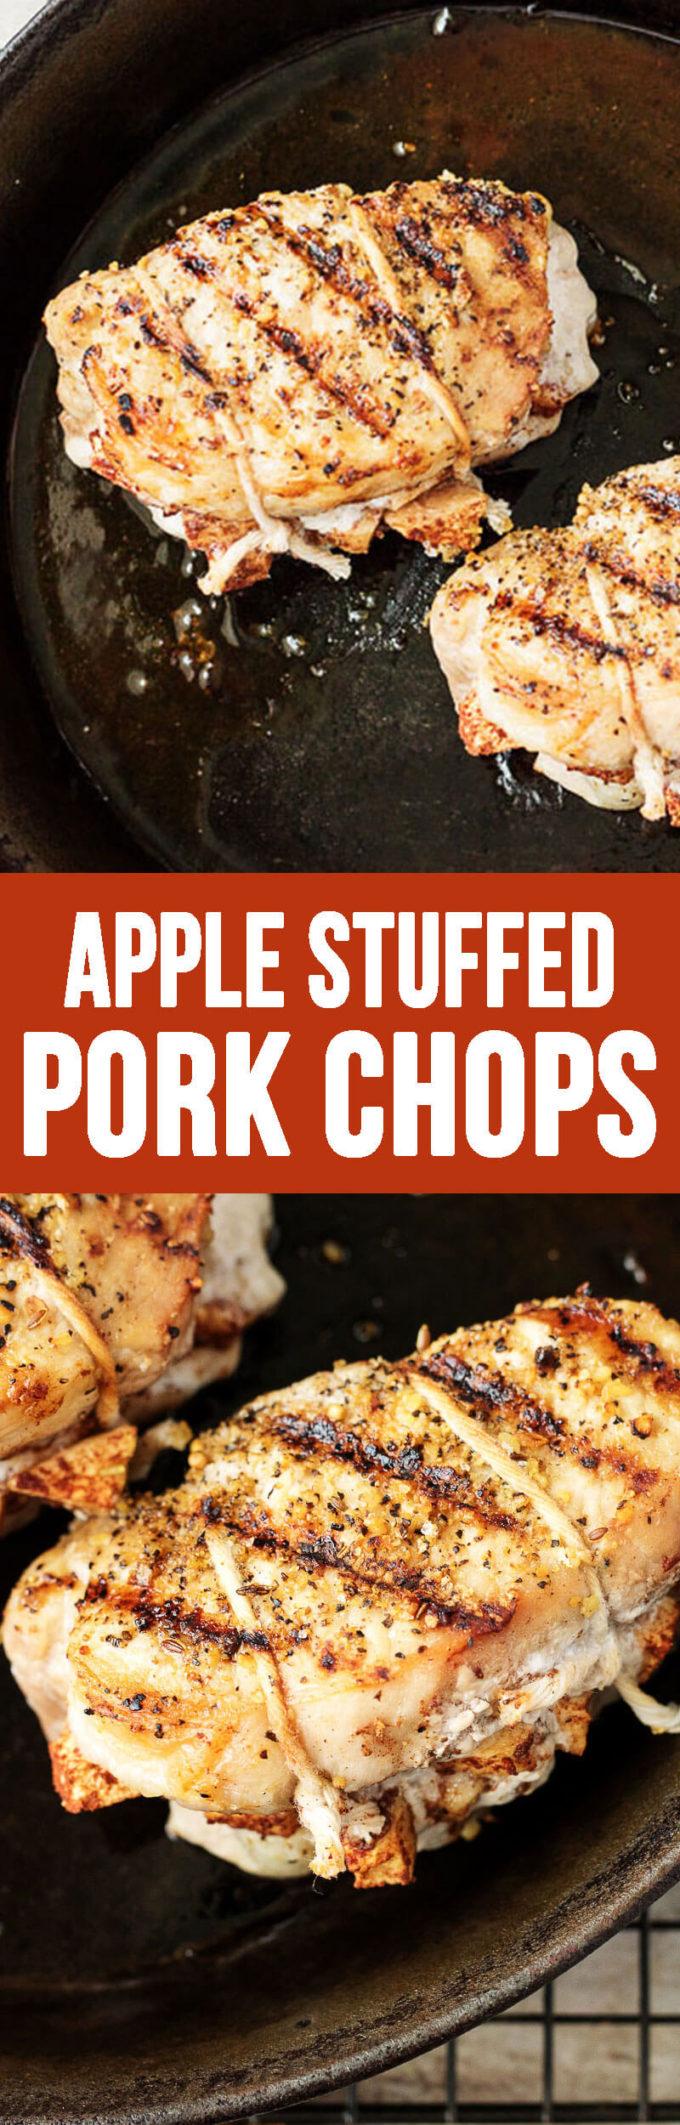 Savory Apple Stuffed Pork Chops